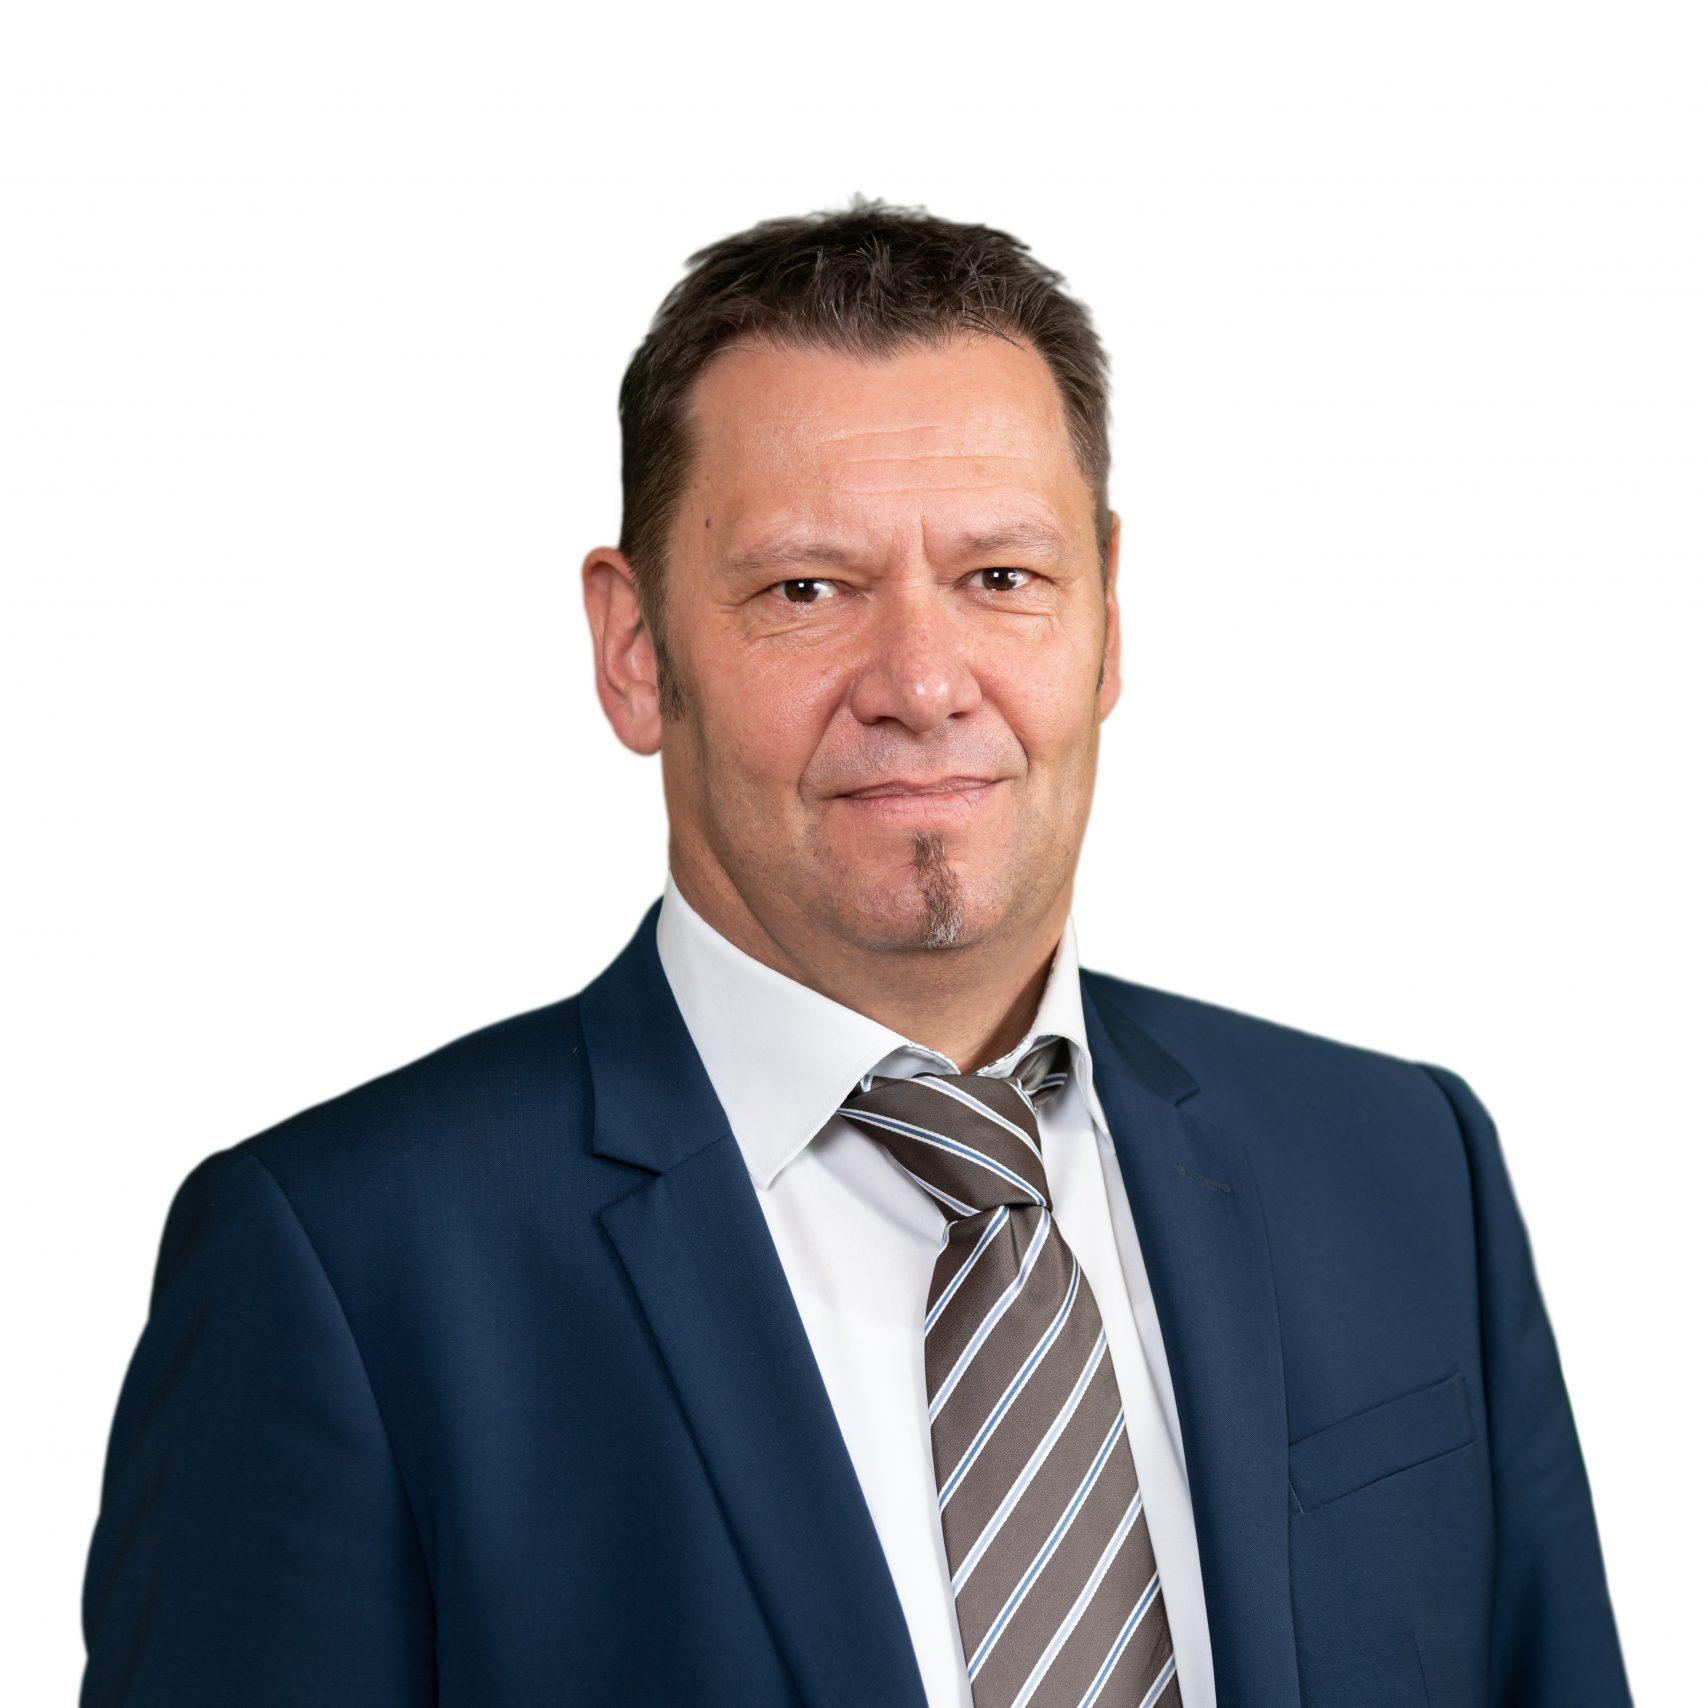 Frank Rolfsmeier Immobilien Nagel